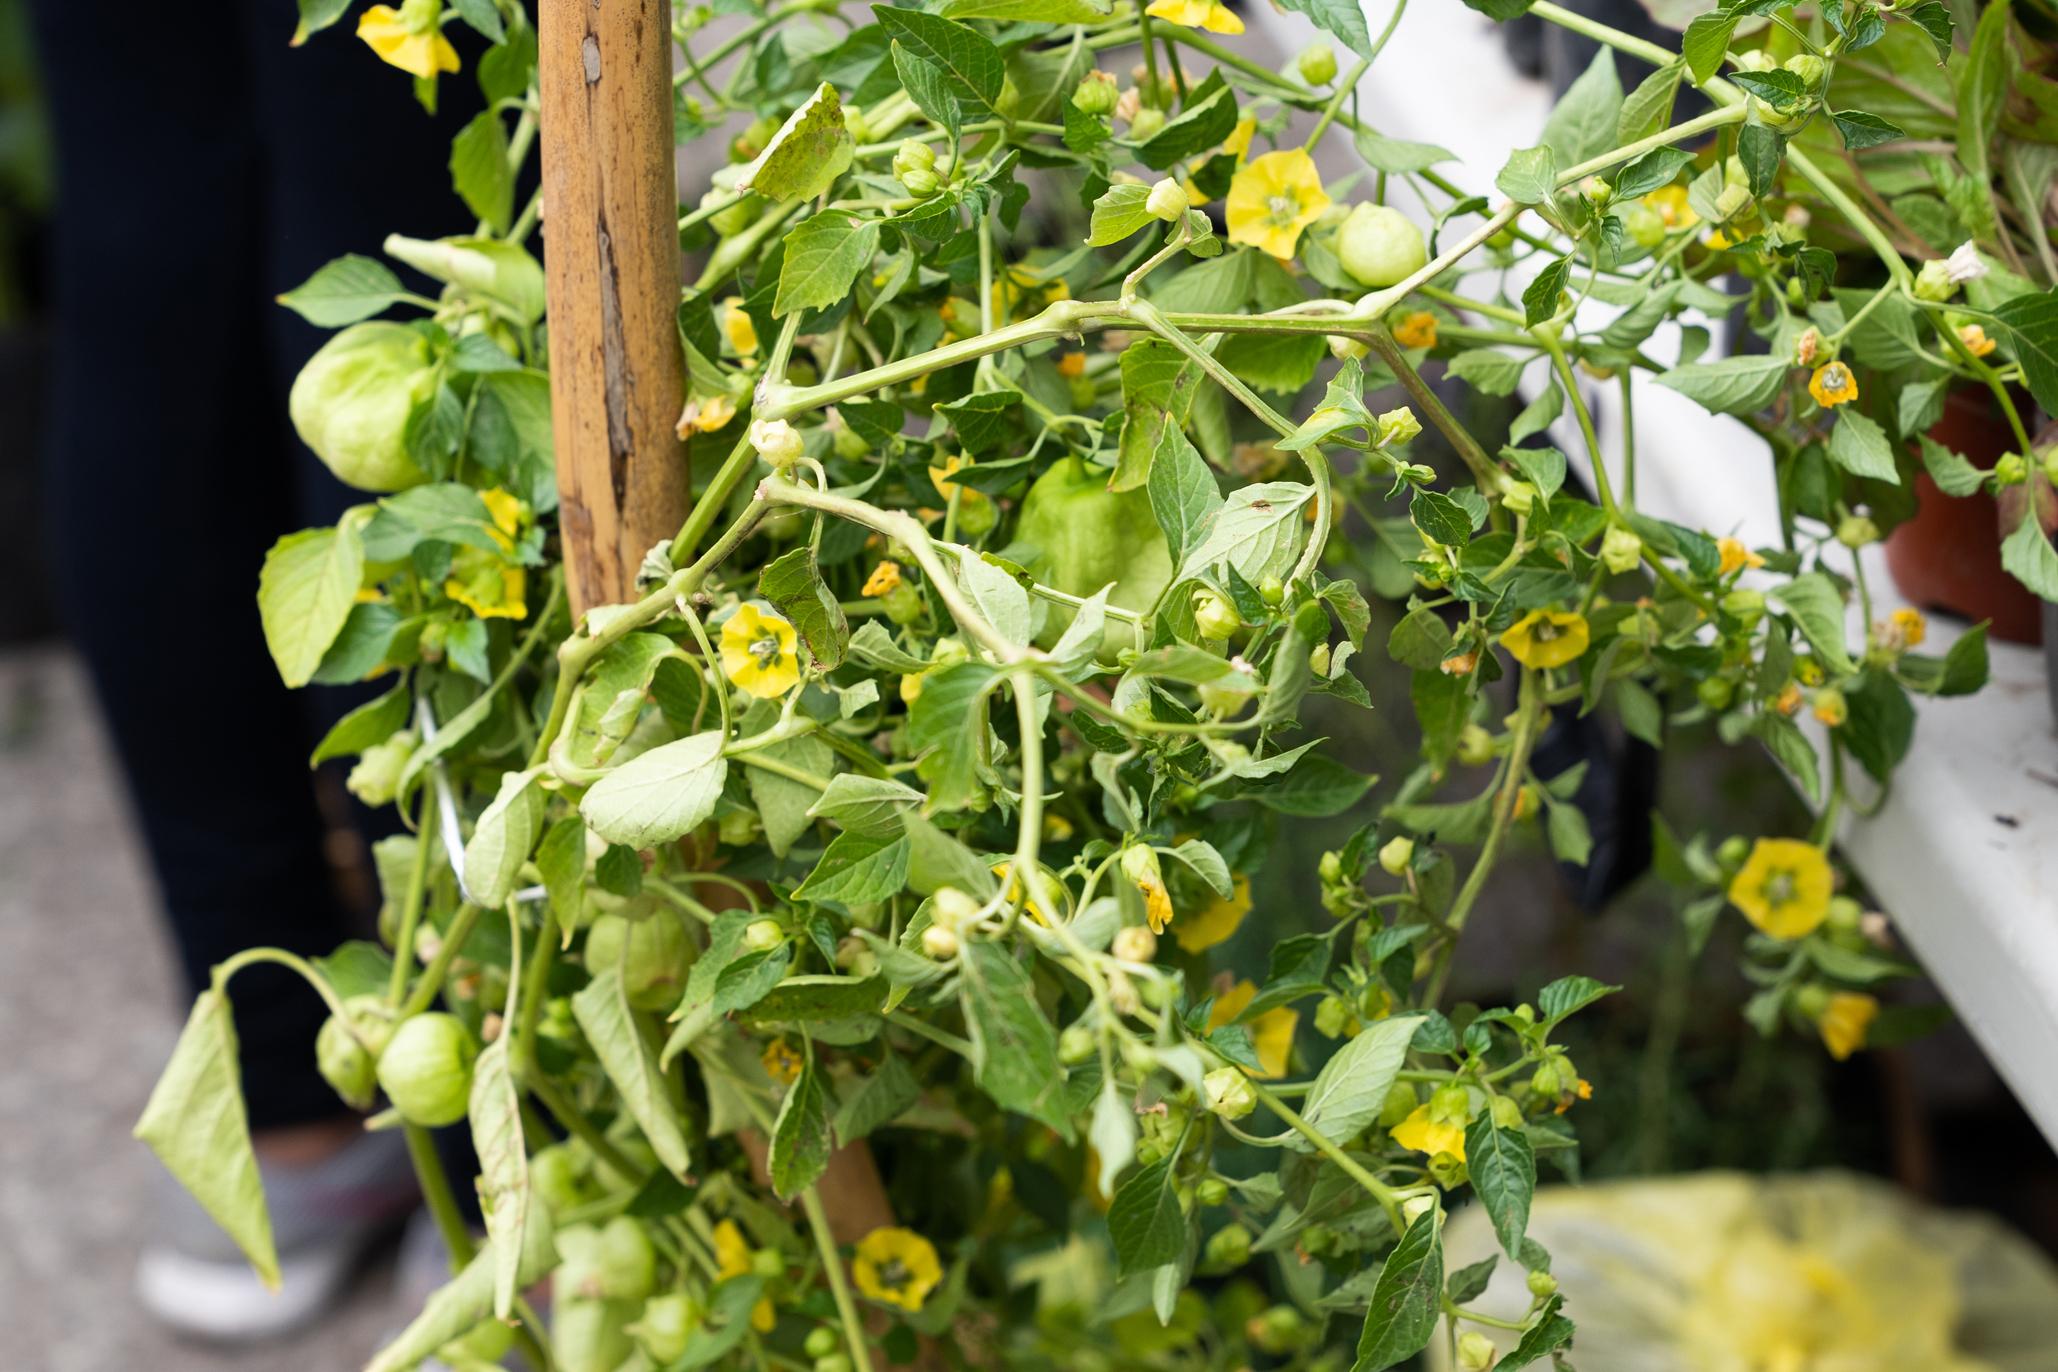 mercado de tlalpal hortaliza